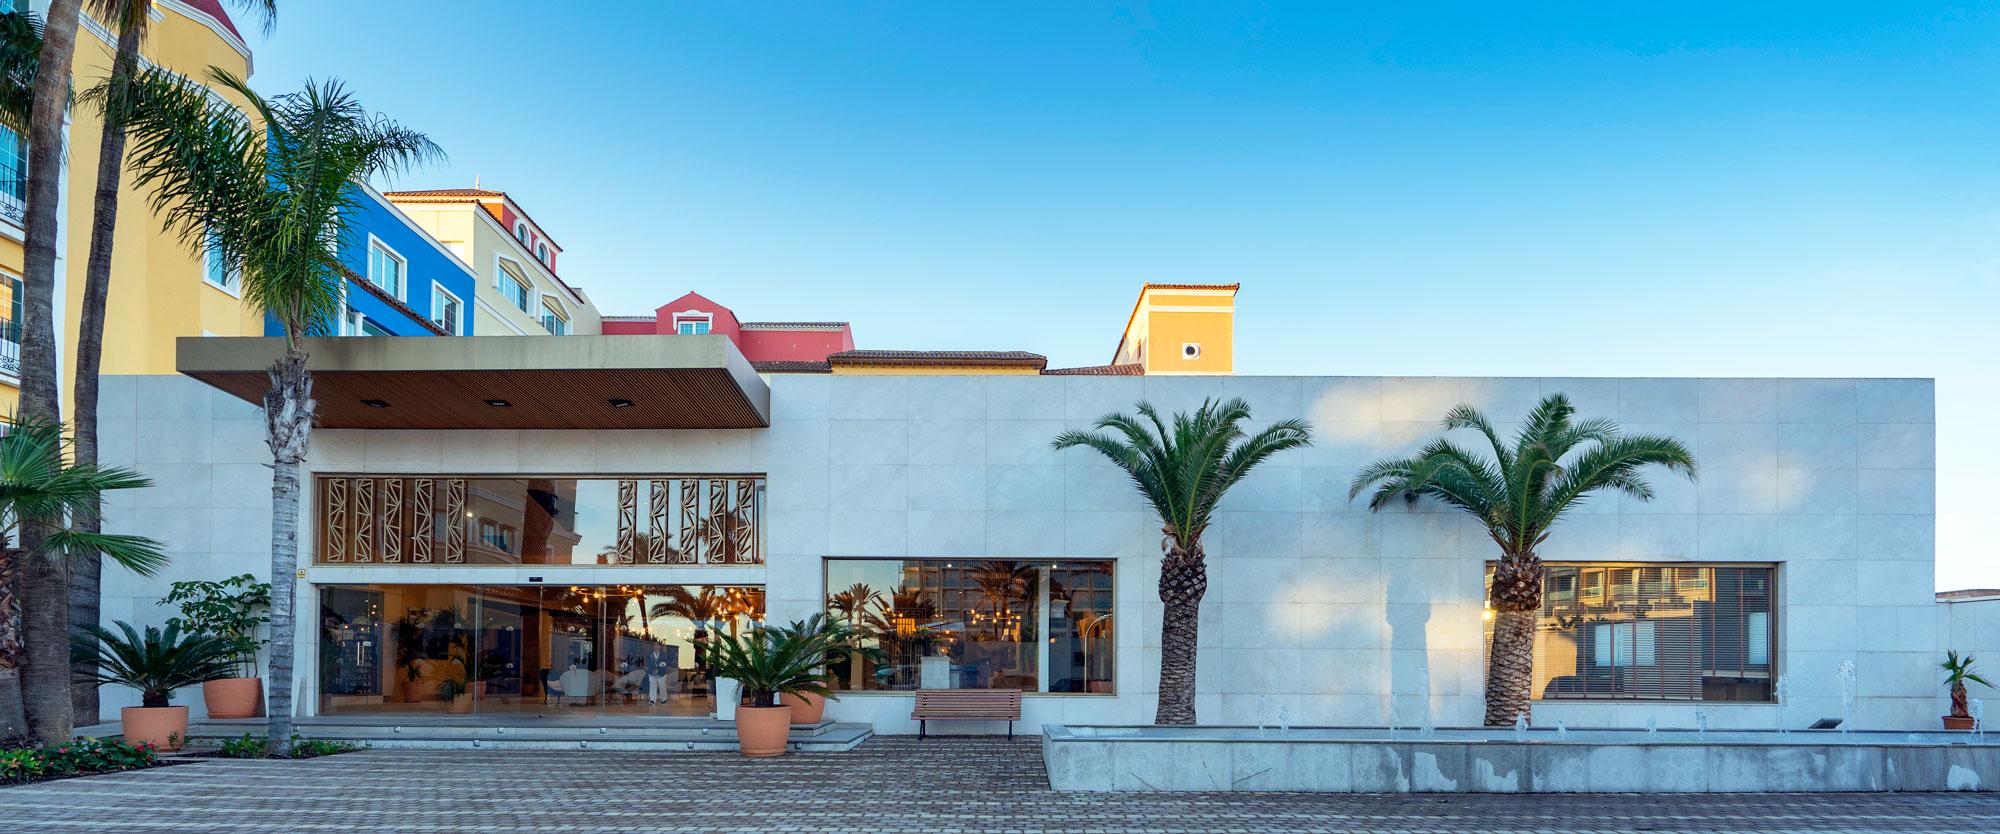 Hotel Mediterráneo  - Hotel Mediterraneo Park 2 Dekton Silestone Piedra Natural Cosentino 47